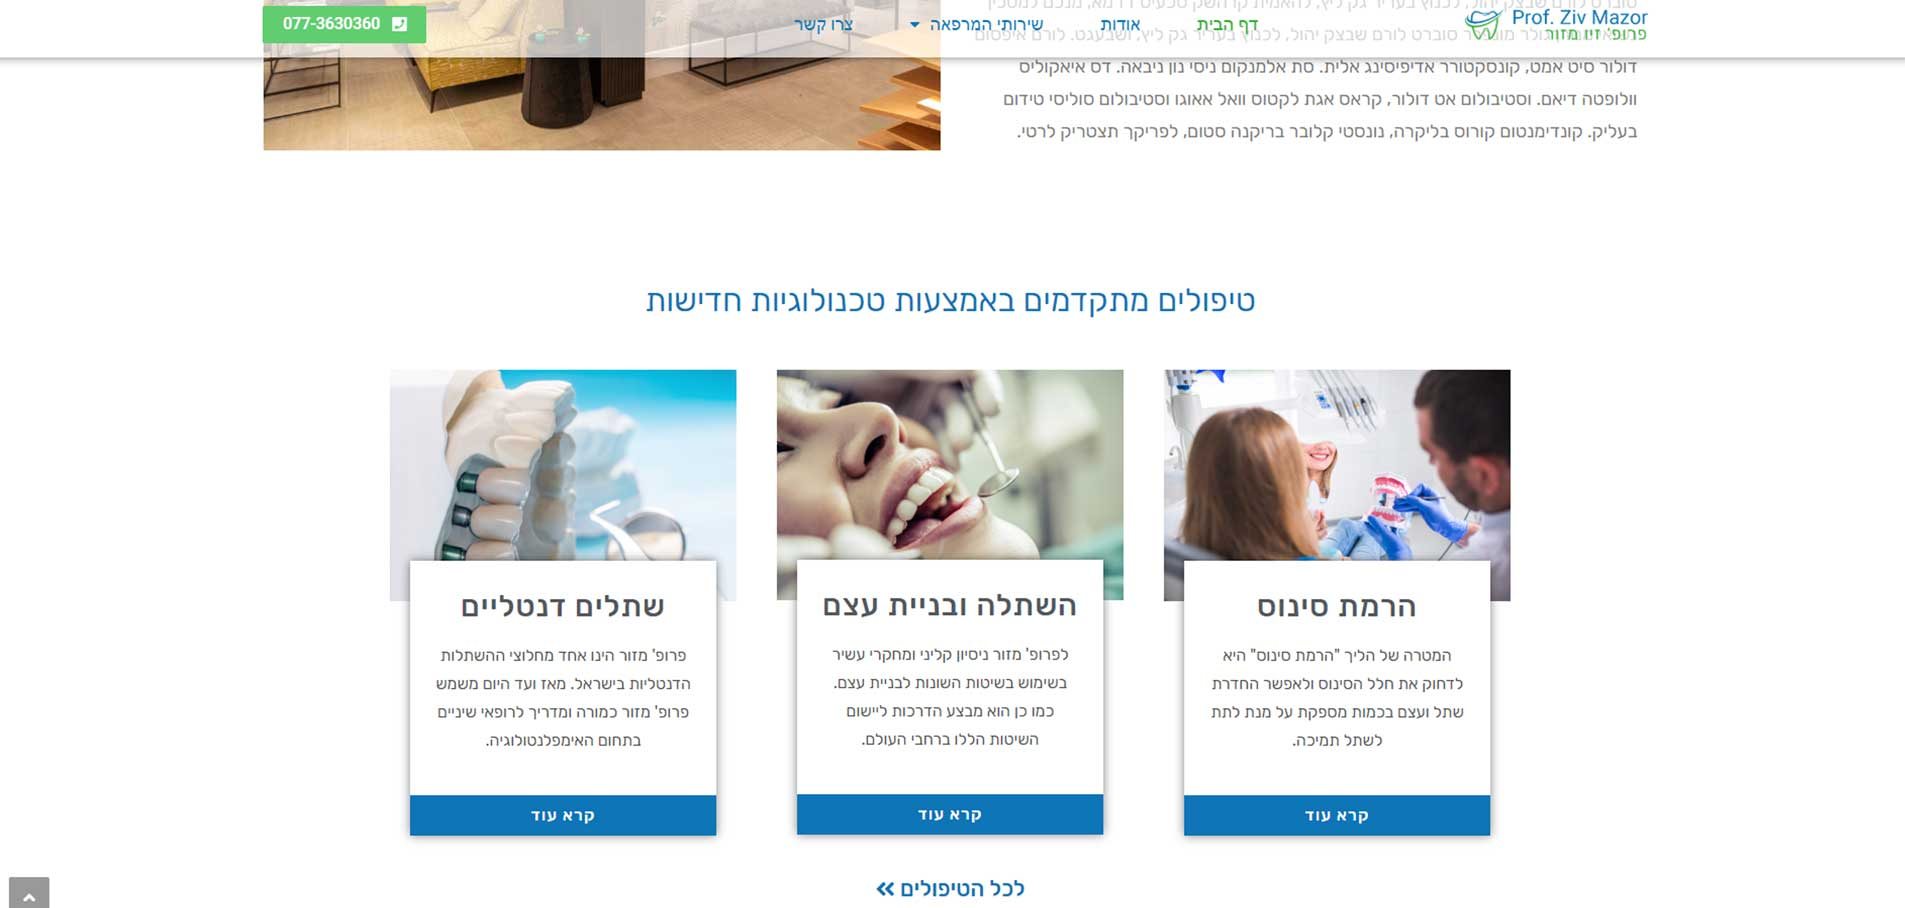 Ziv Mazor website D